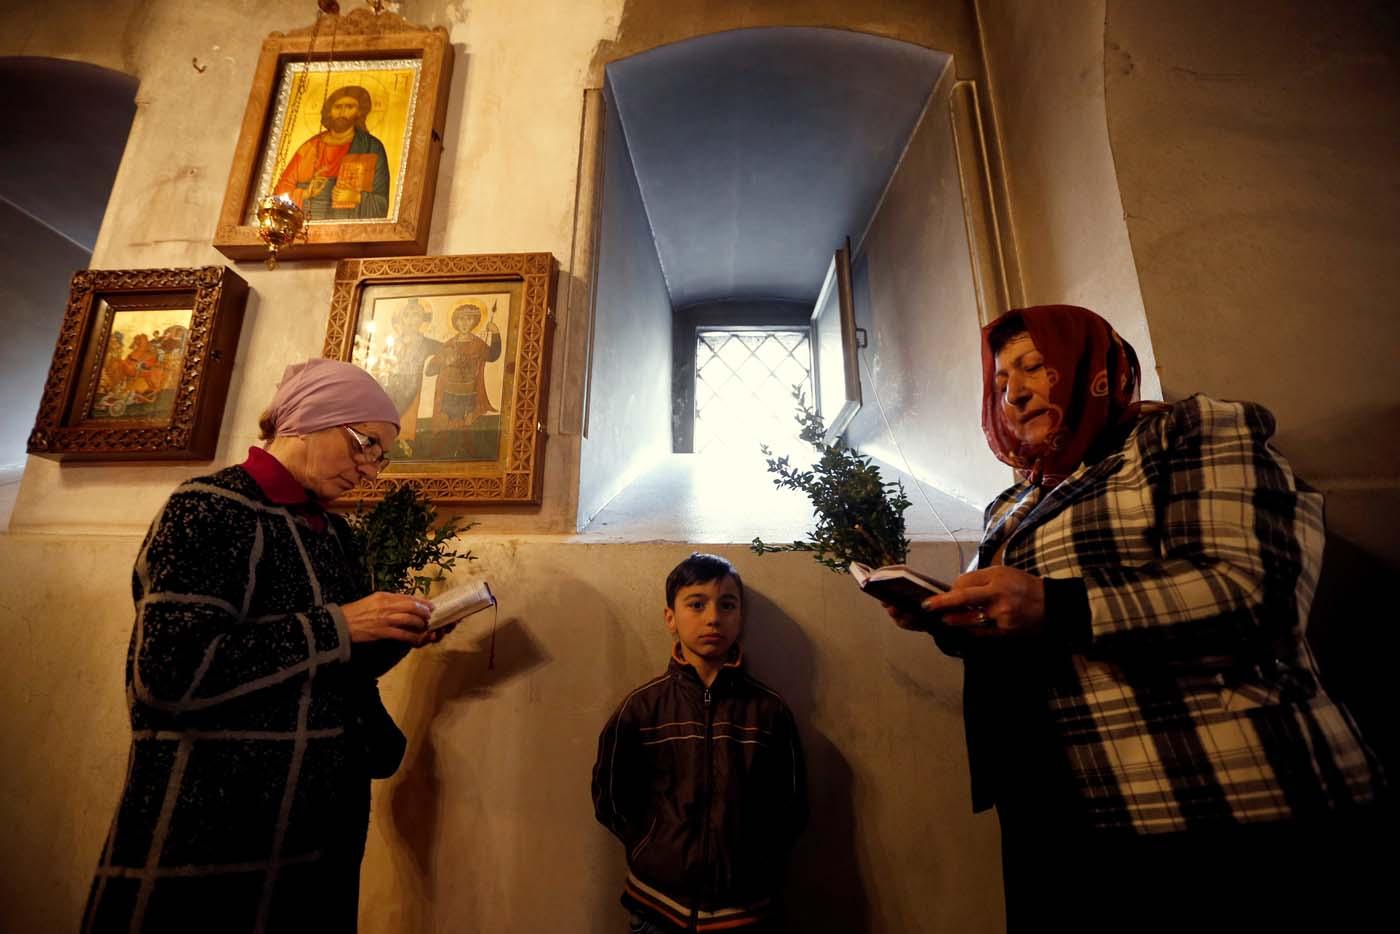 Worshippers attend the Palm Sunday service in Tbilisi, Georgia April 9, 2017. REUTERS/David Mdzinarishvili